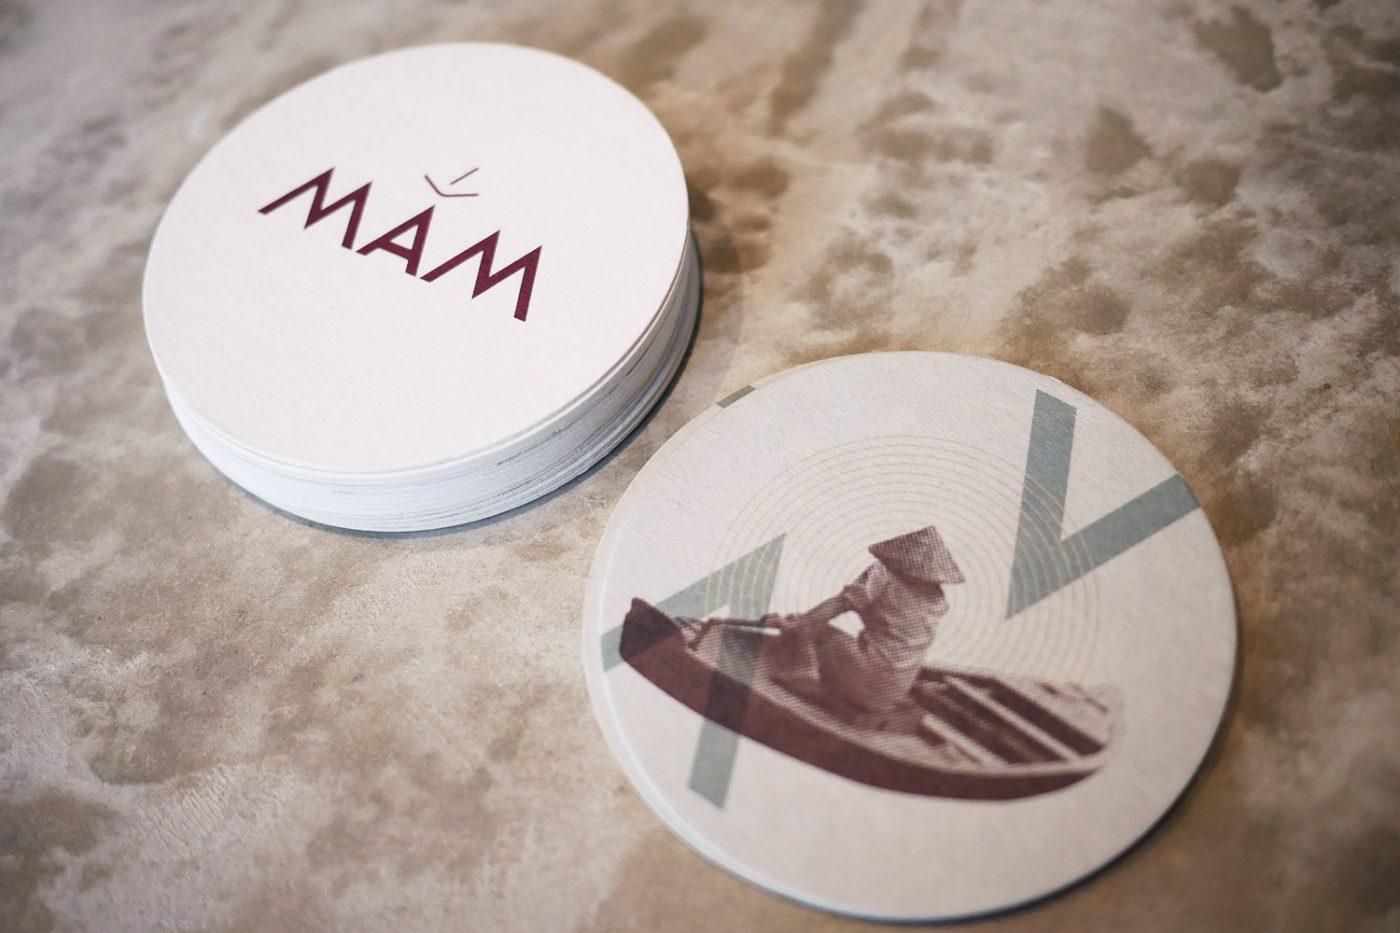 Mam_Restaurant_bar_Design_details_interior_branding_coaster_logo_vietnamese